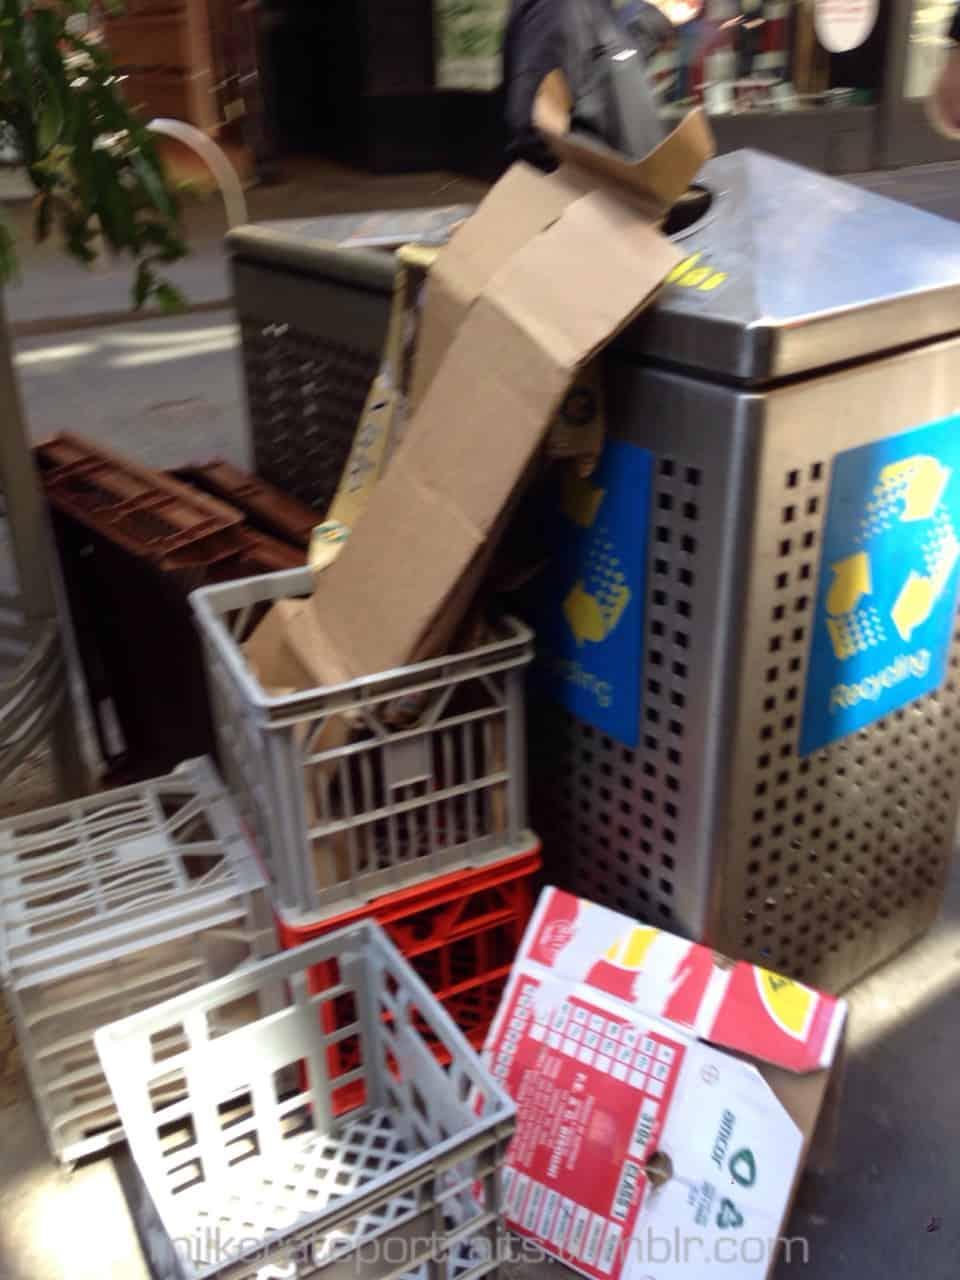 Blurry rubbish crates